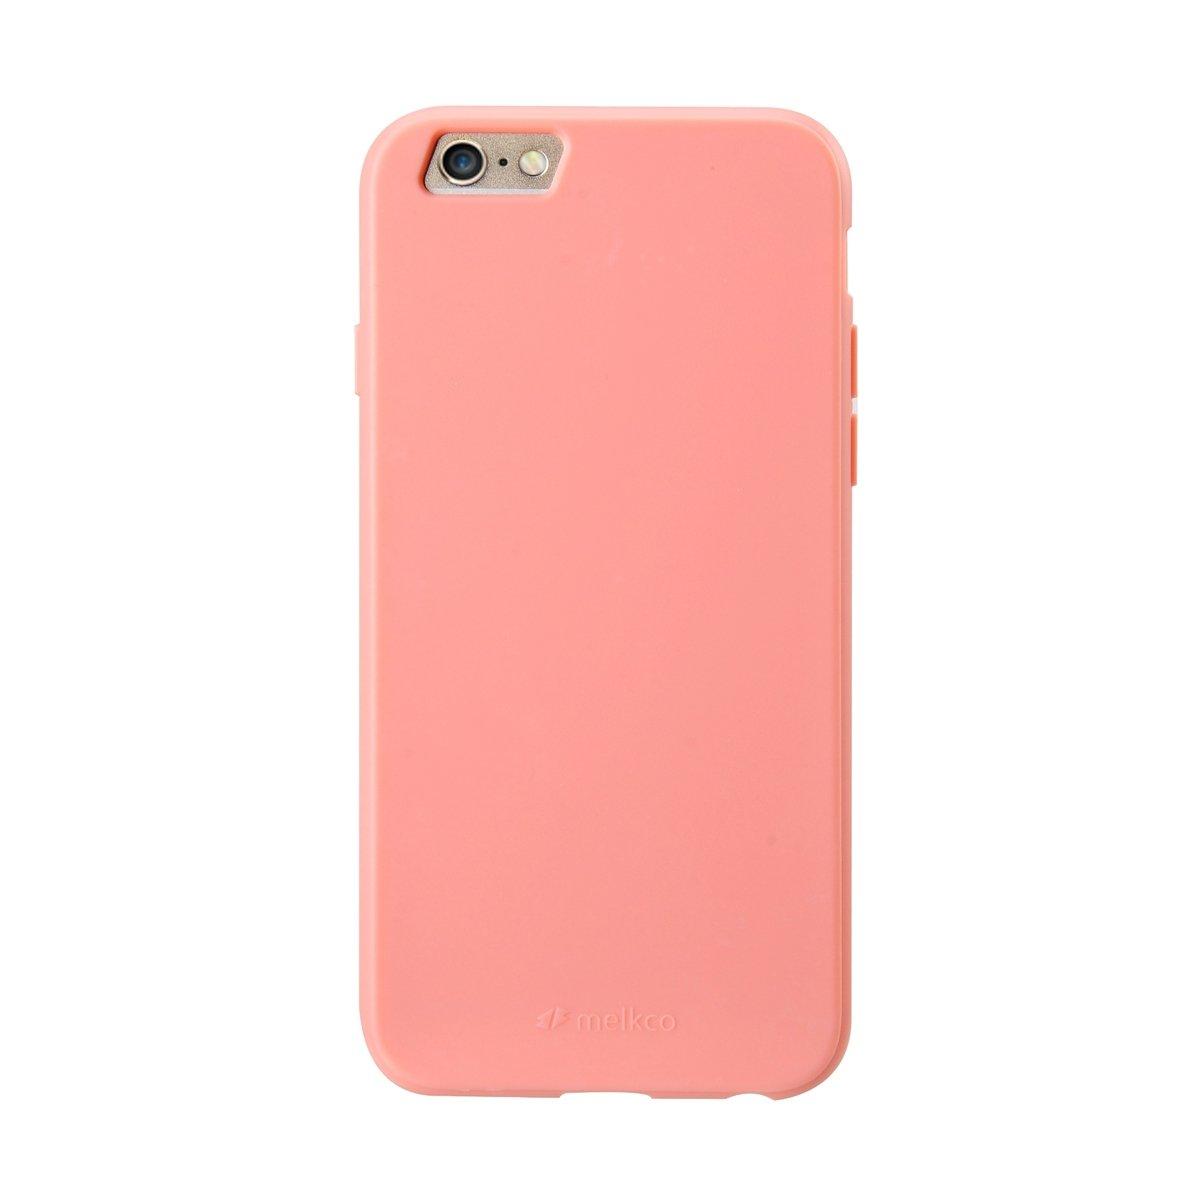 "iPhone 6 Plus/6S Plus (5.5"") Poly Jacket 手機保護殼 - 珍珠粉紅色(附送屏幕保護貼)"